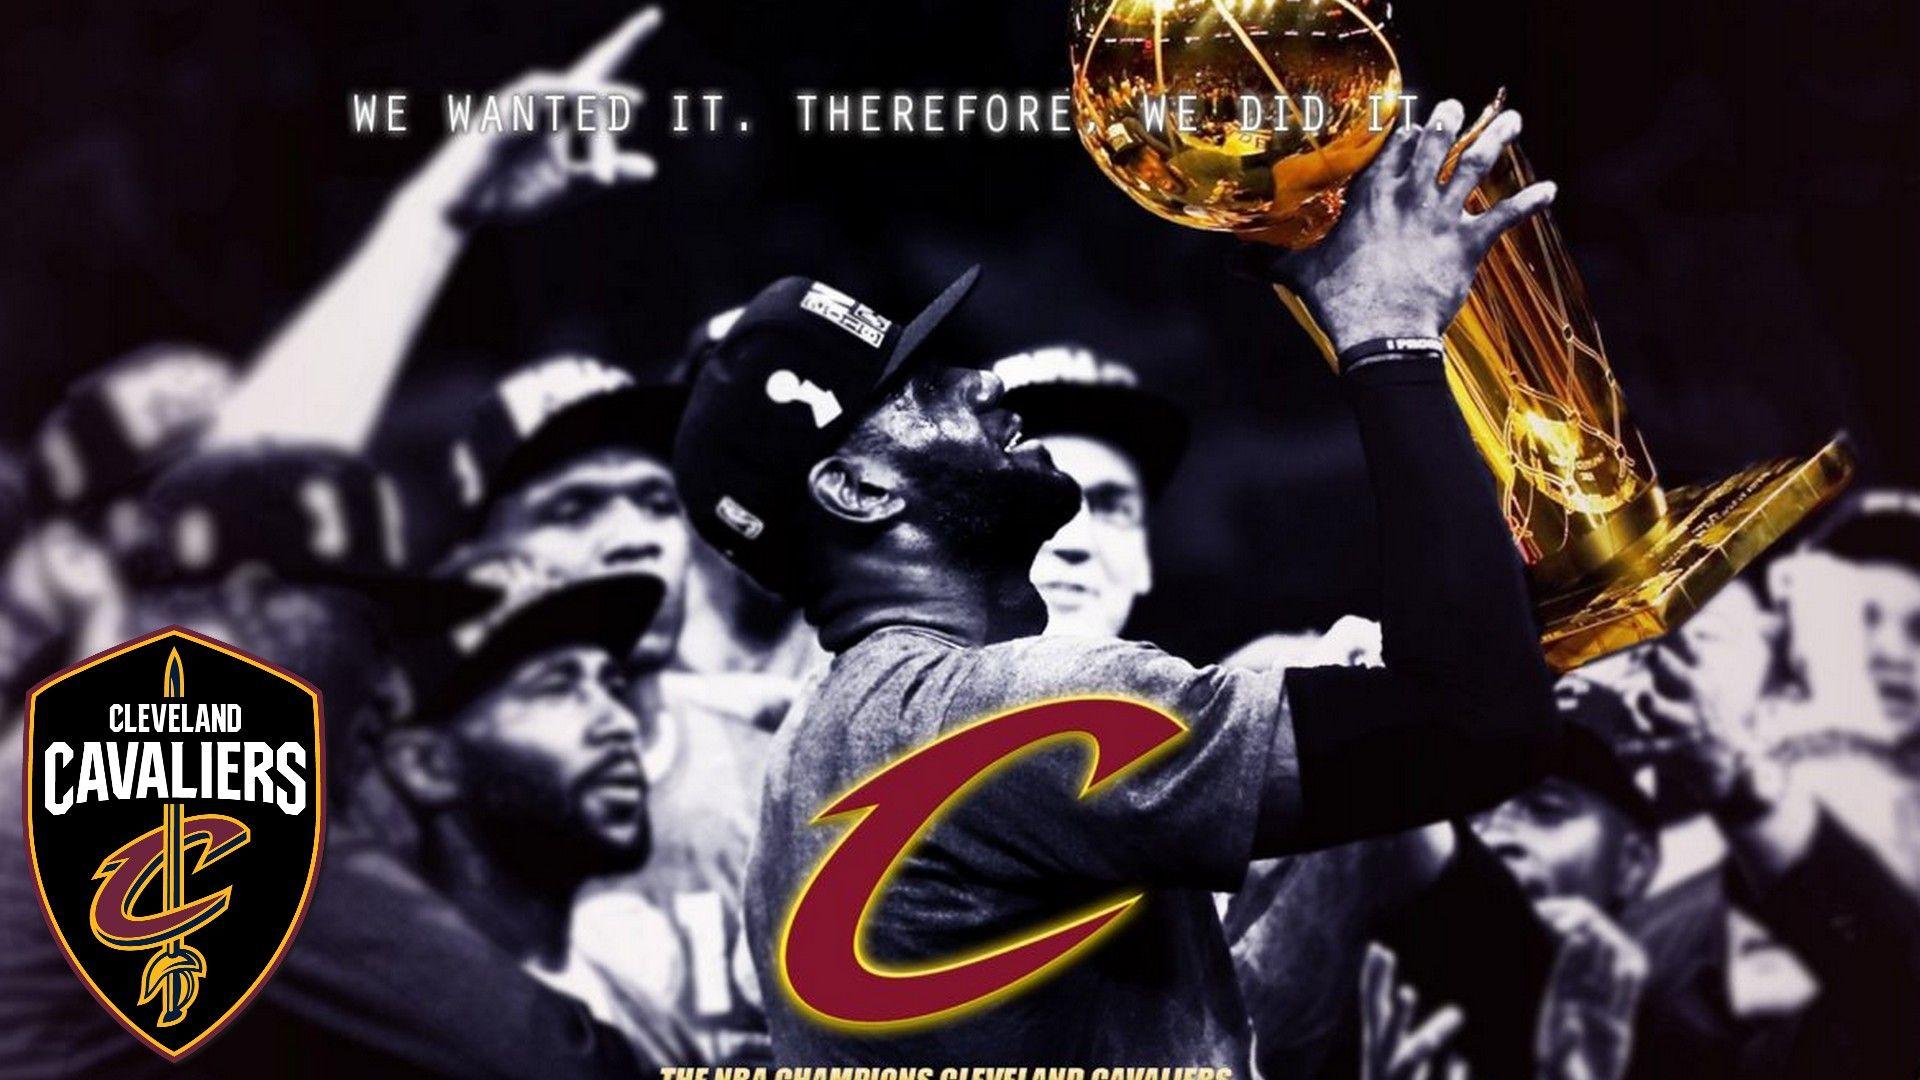 Hd Cleveland Cavaliers Nba Backgrounds 2020 Basketball Wallpaper Cavaliers Nba Nba Background Cavaliers Wallpaper